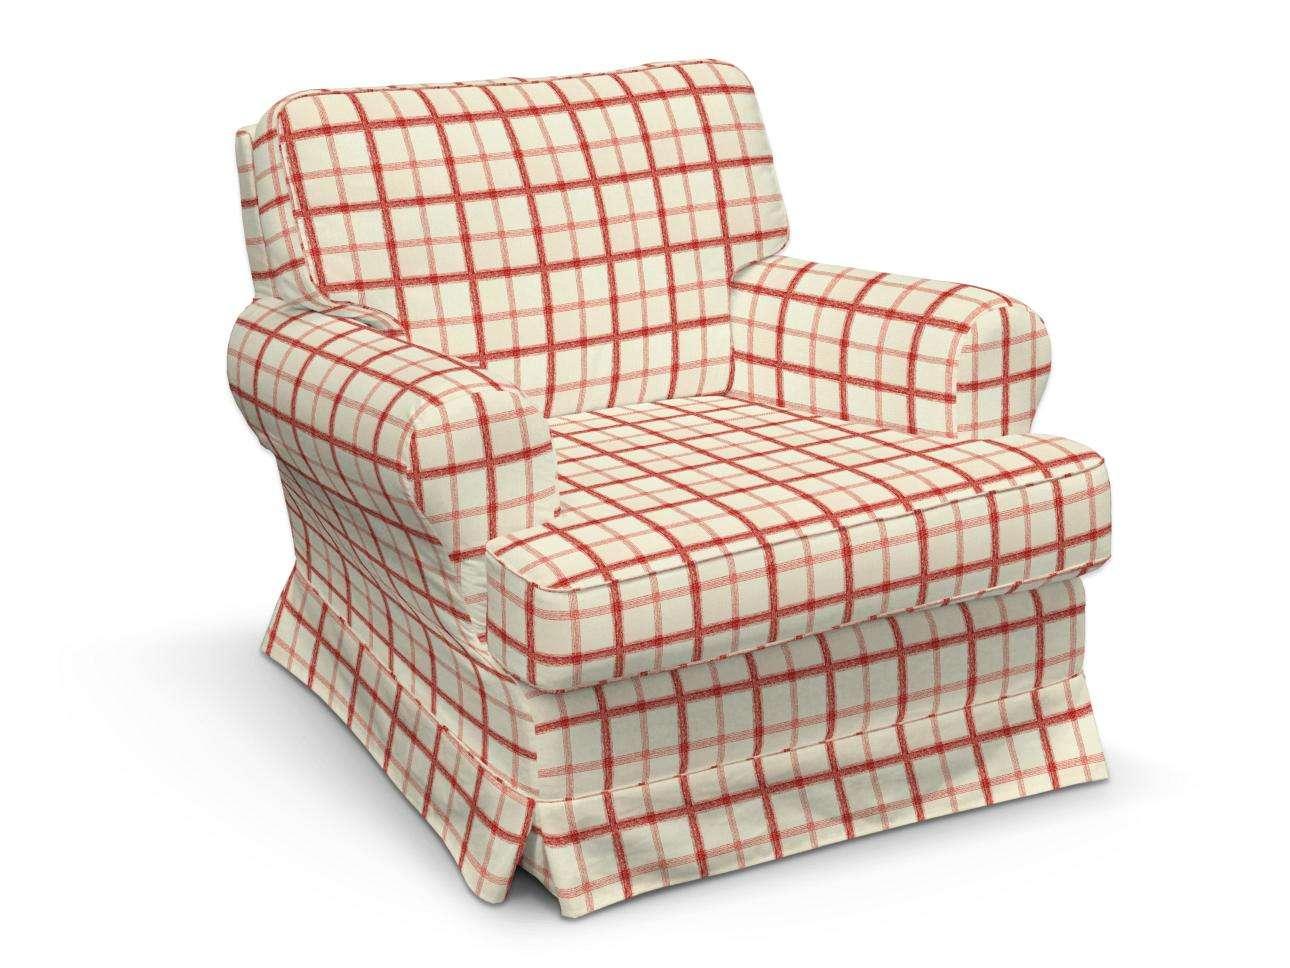 Pokrowiec na fotel Barkaby fotel Barkaby w kolekcji Avinon, tkanina: 131-15